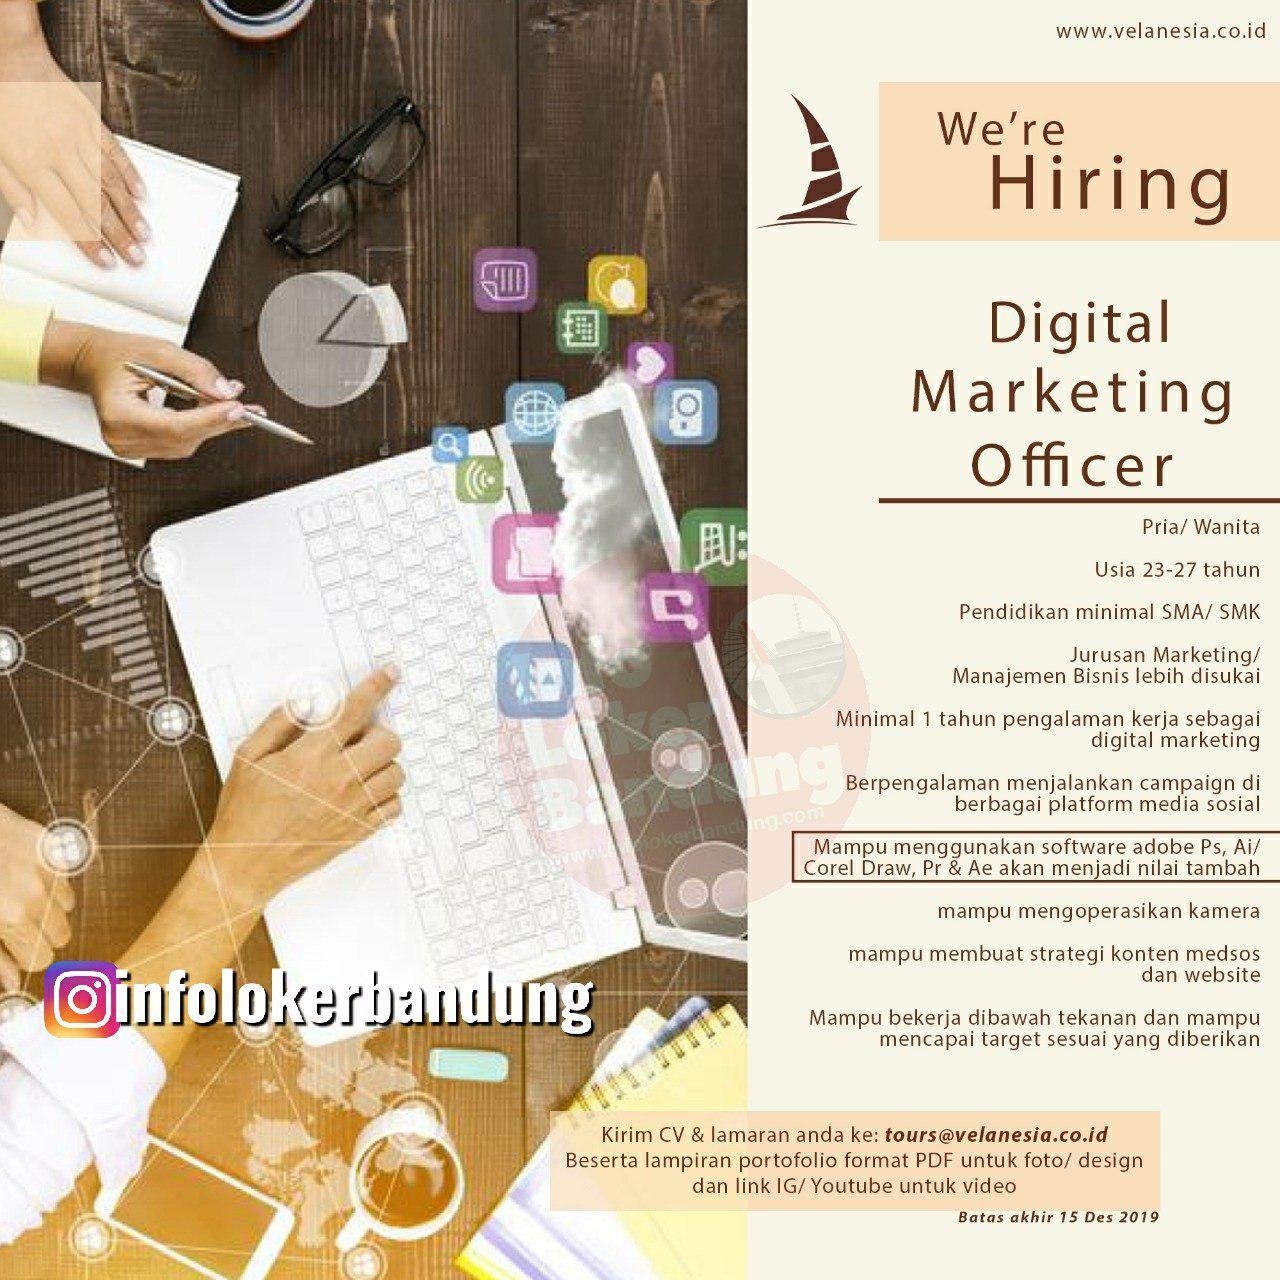 Lowongan Kerja Digital Marketing Officer Velanesia Bandung November 2019